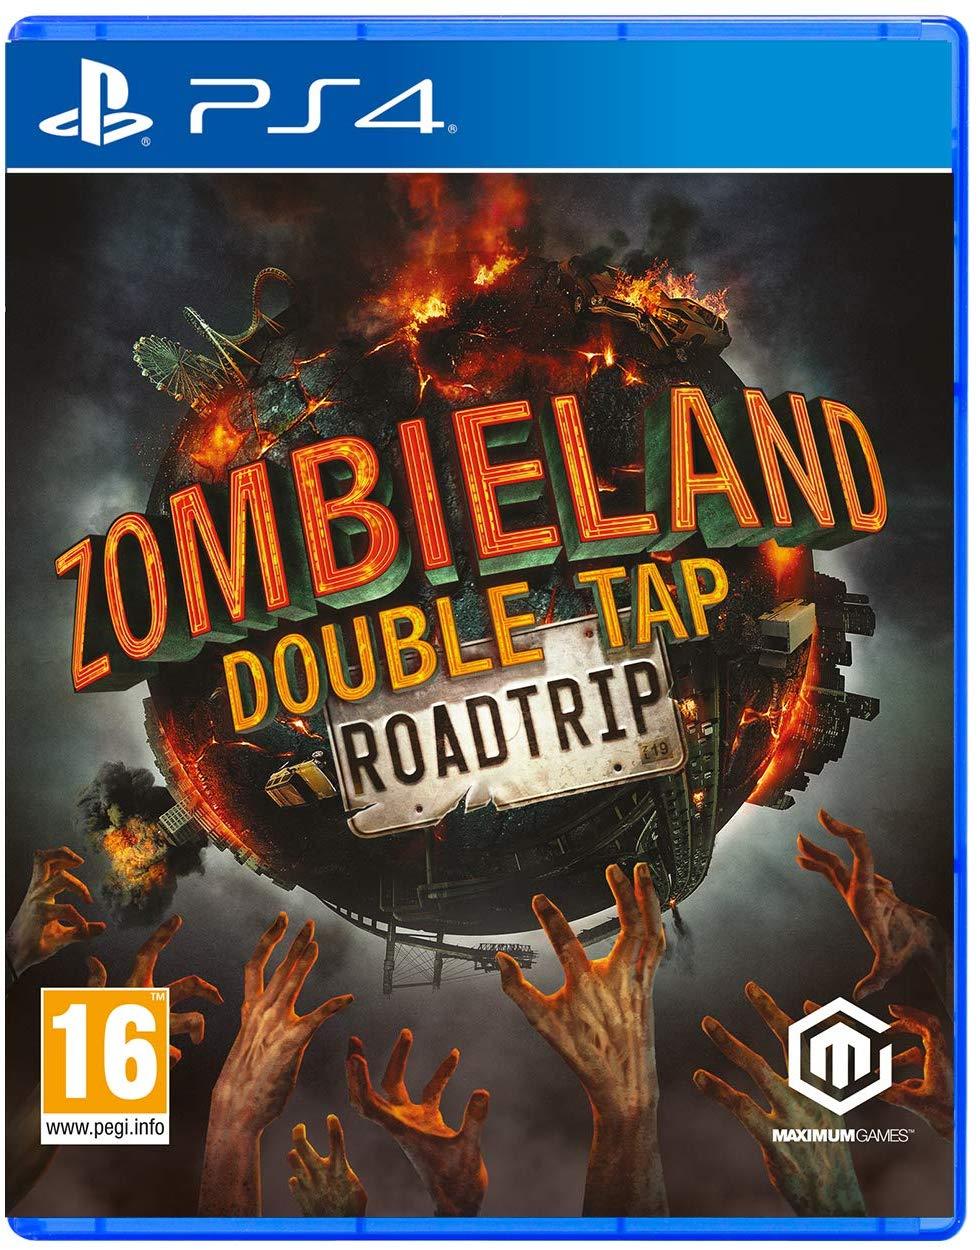 Zombieland Double Tap Road Trip - PlayStation 4 Játékok